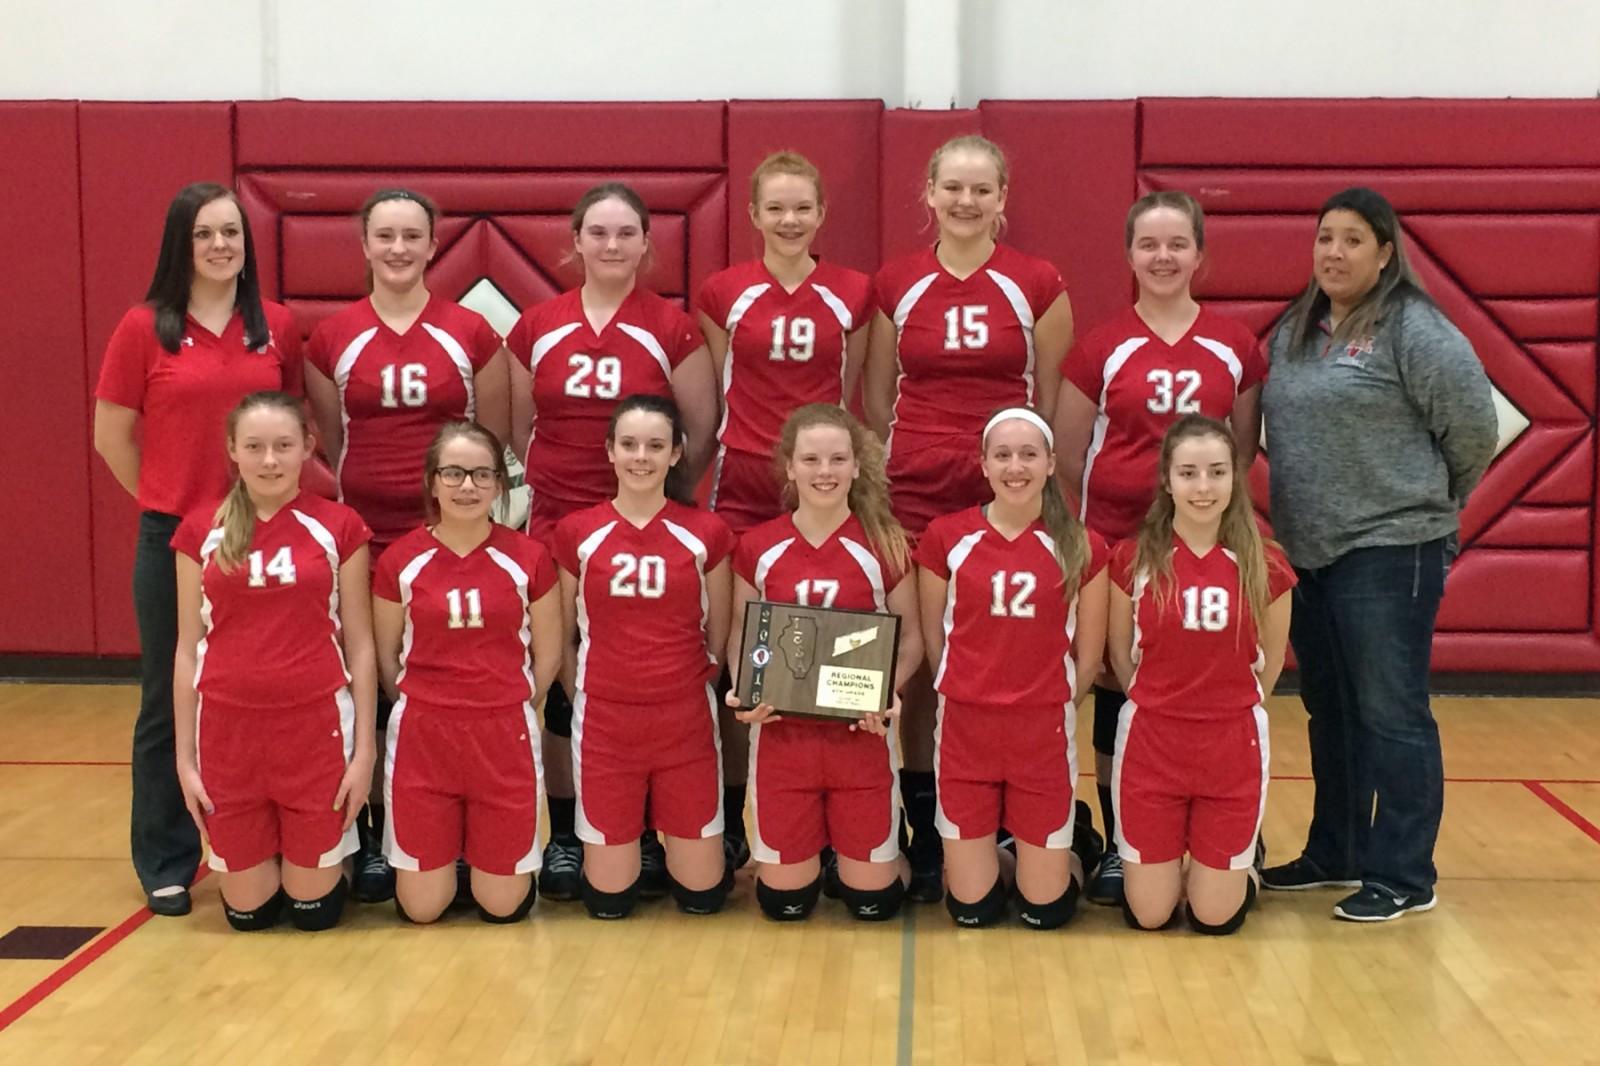 Lady Vandals 8th grade volleyball team wins Regional Championship